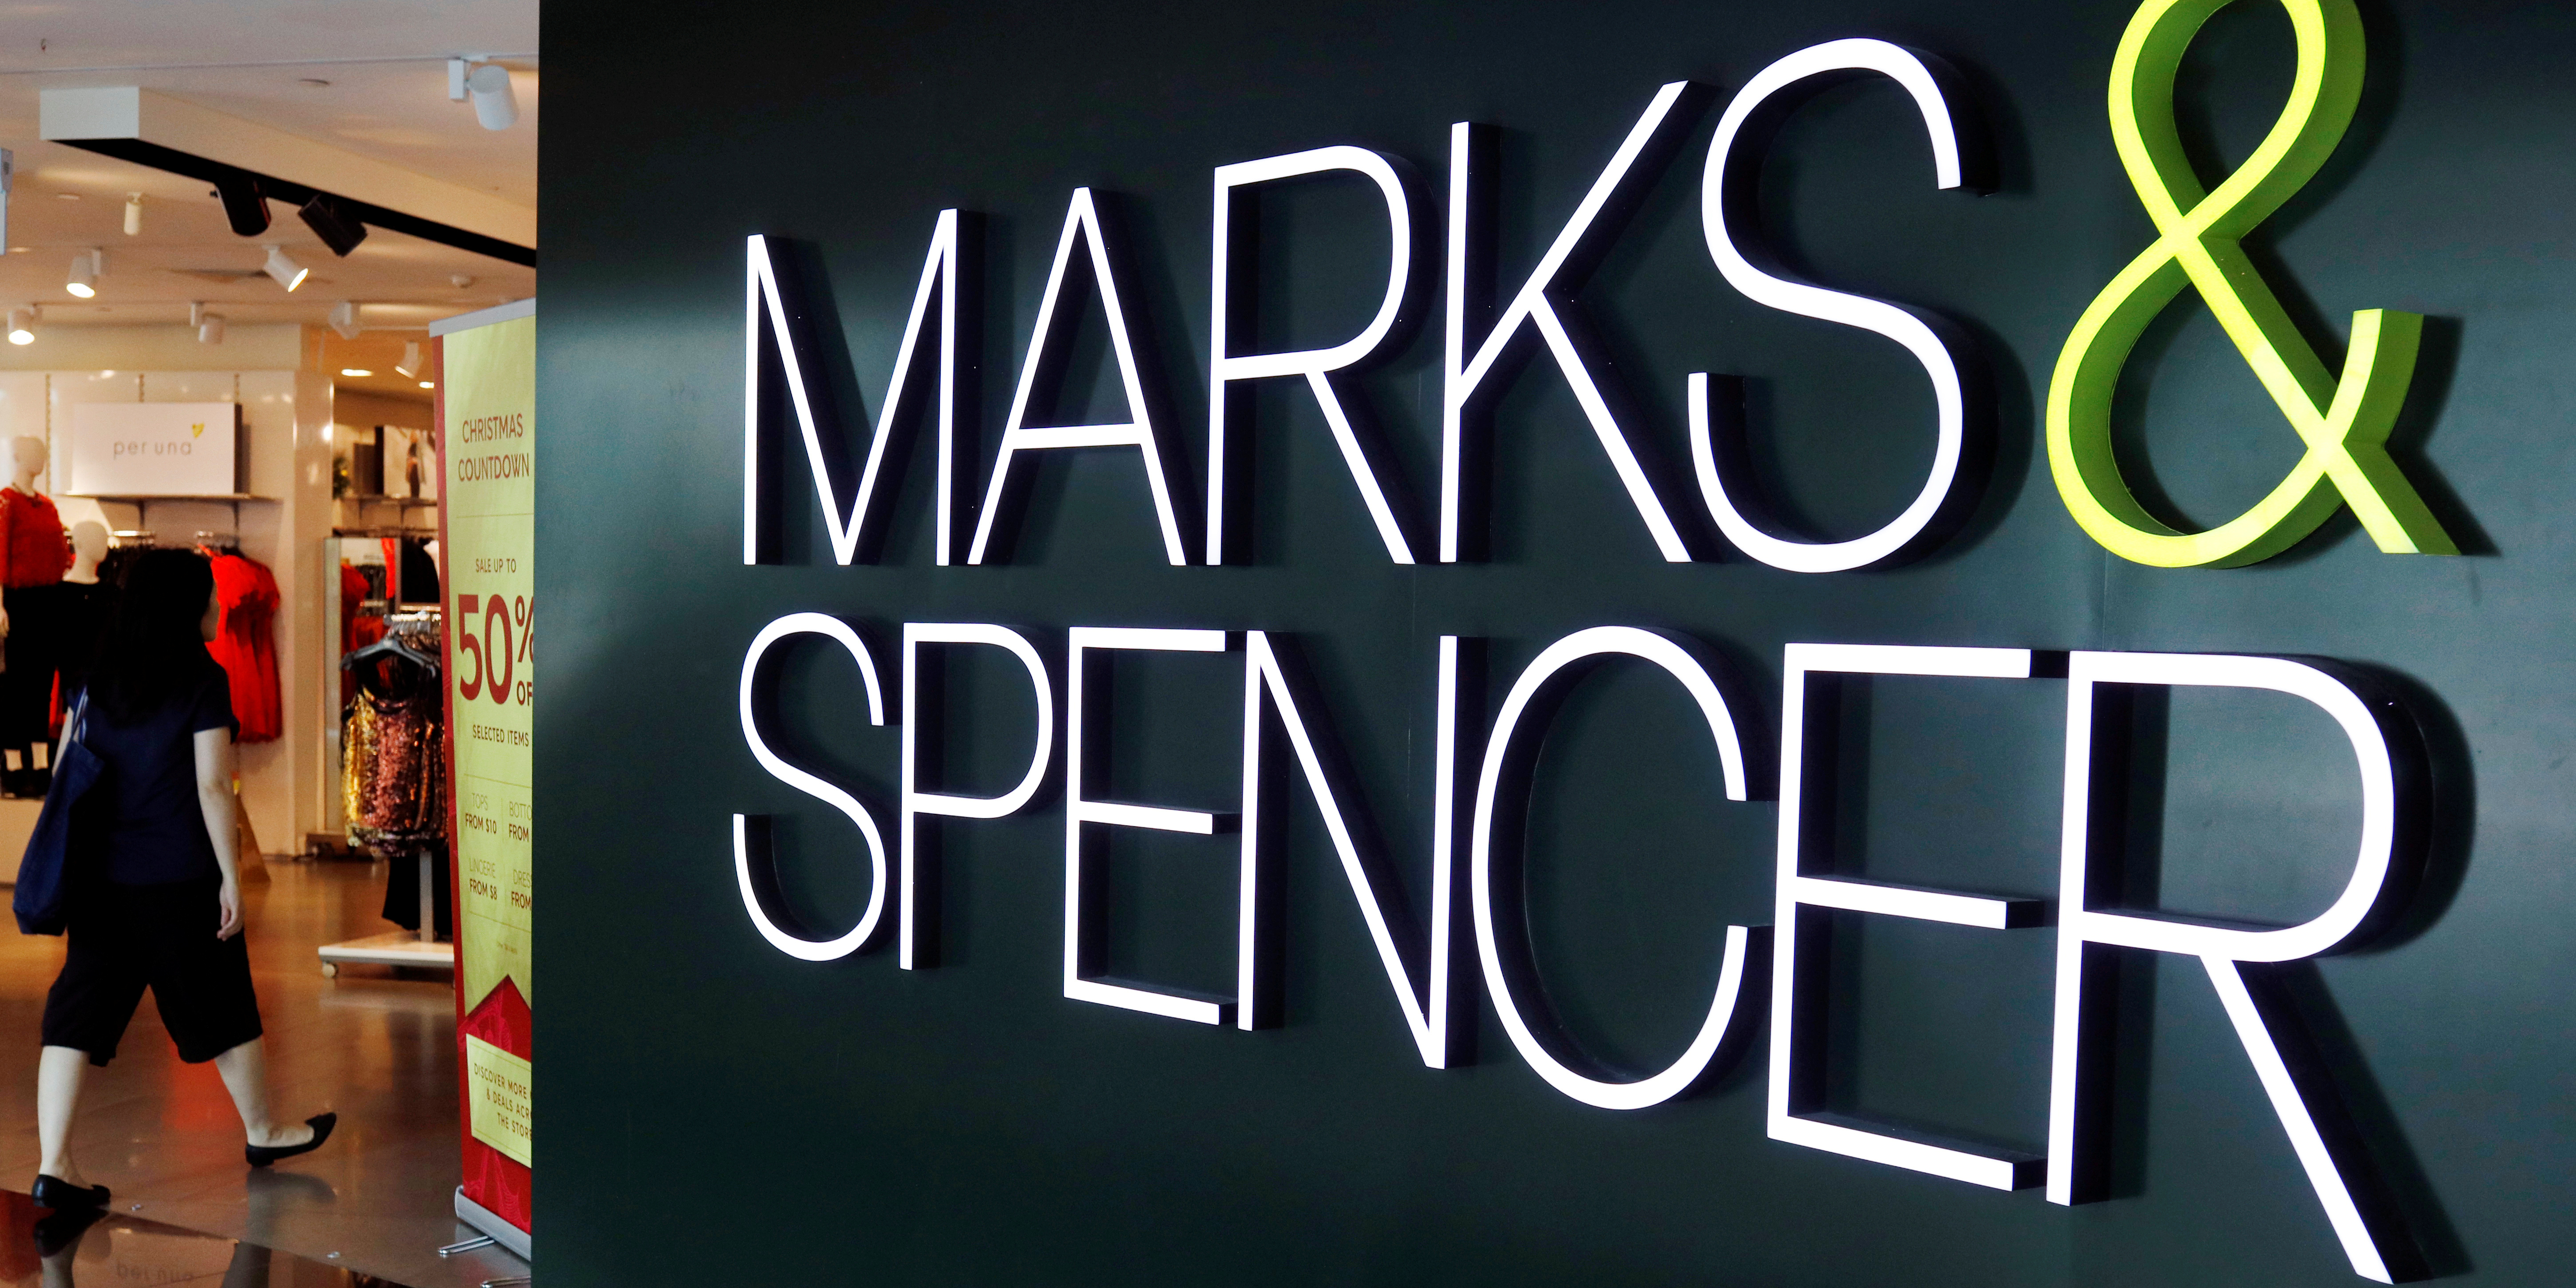 marks-spencer-cree-une-coentreprise-pour-se-renforcer-en-ligne